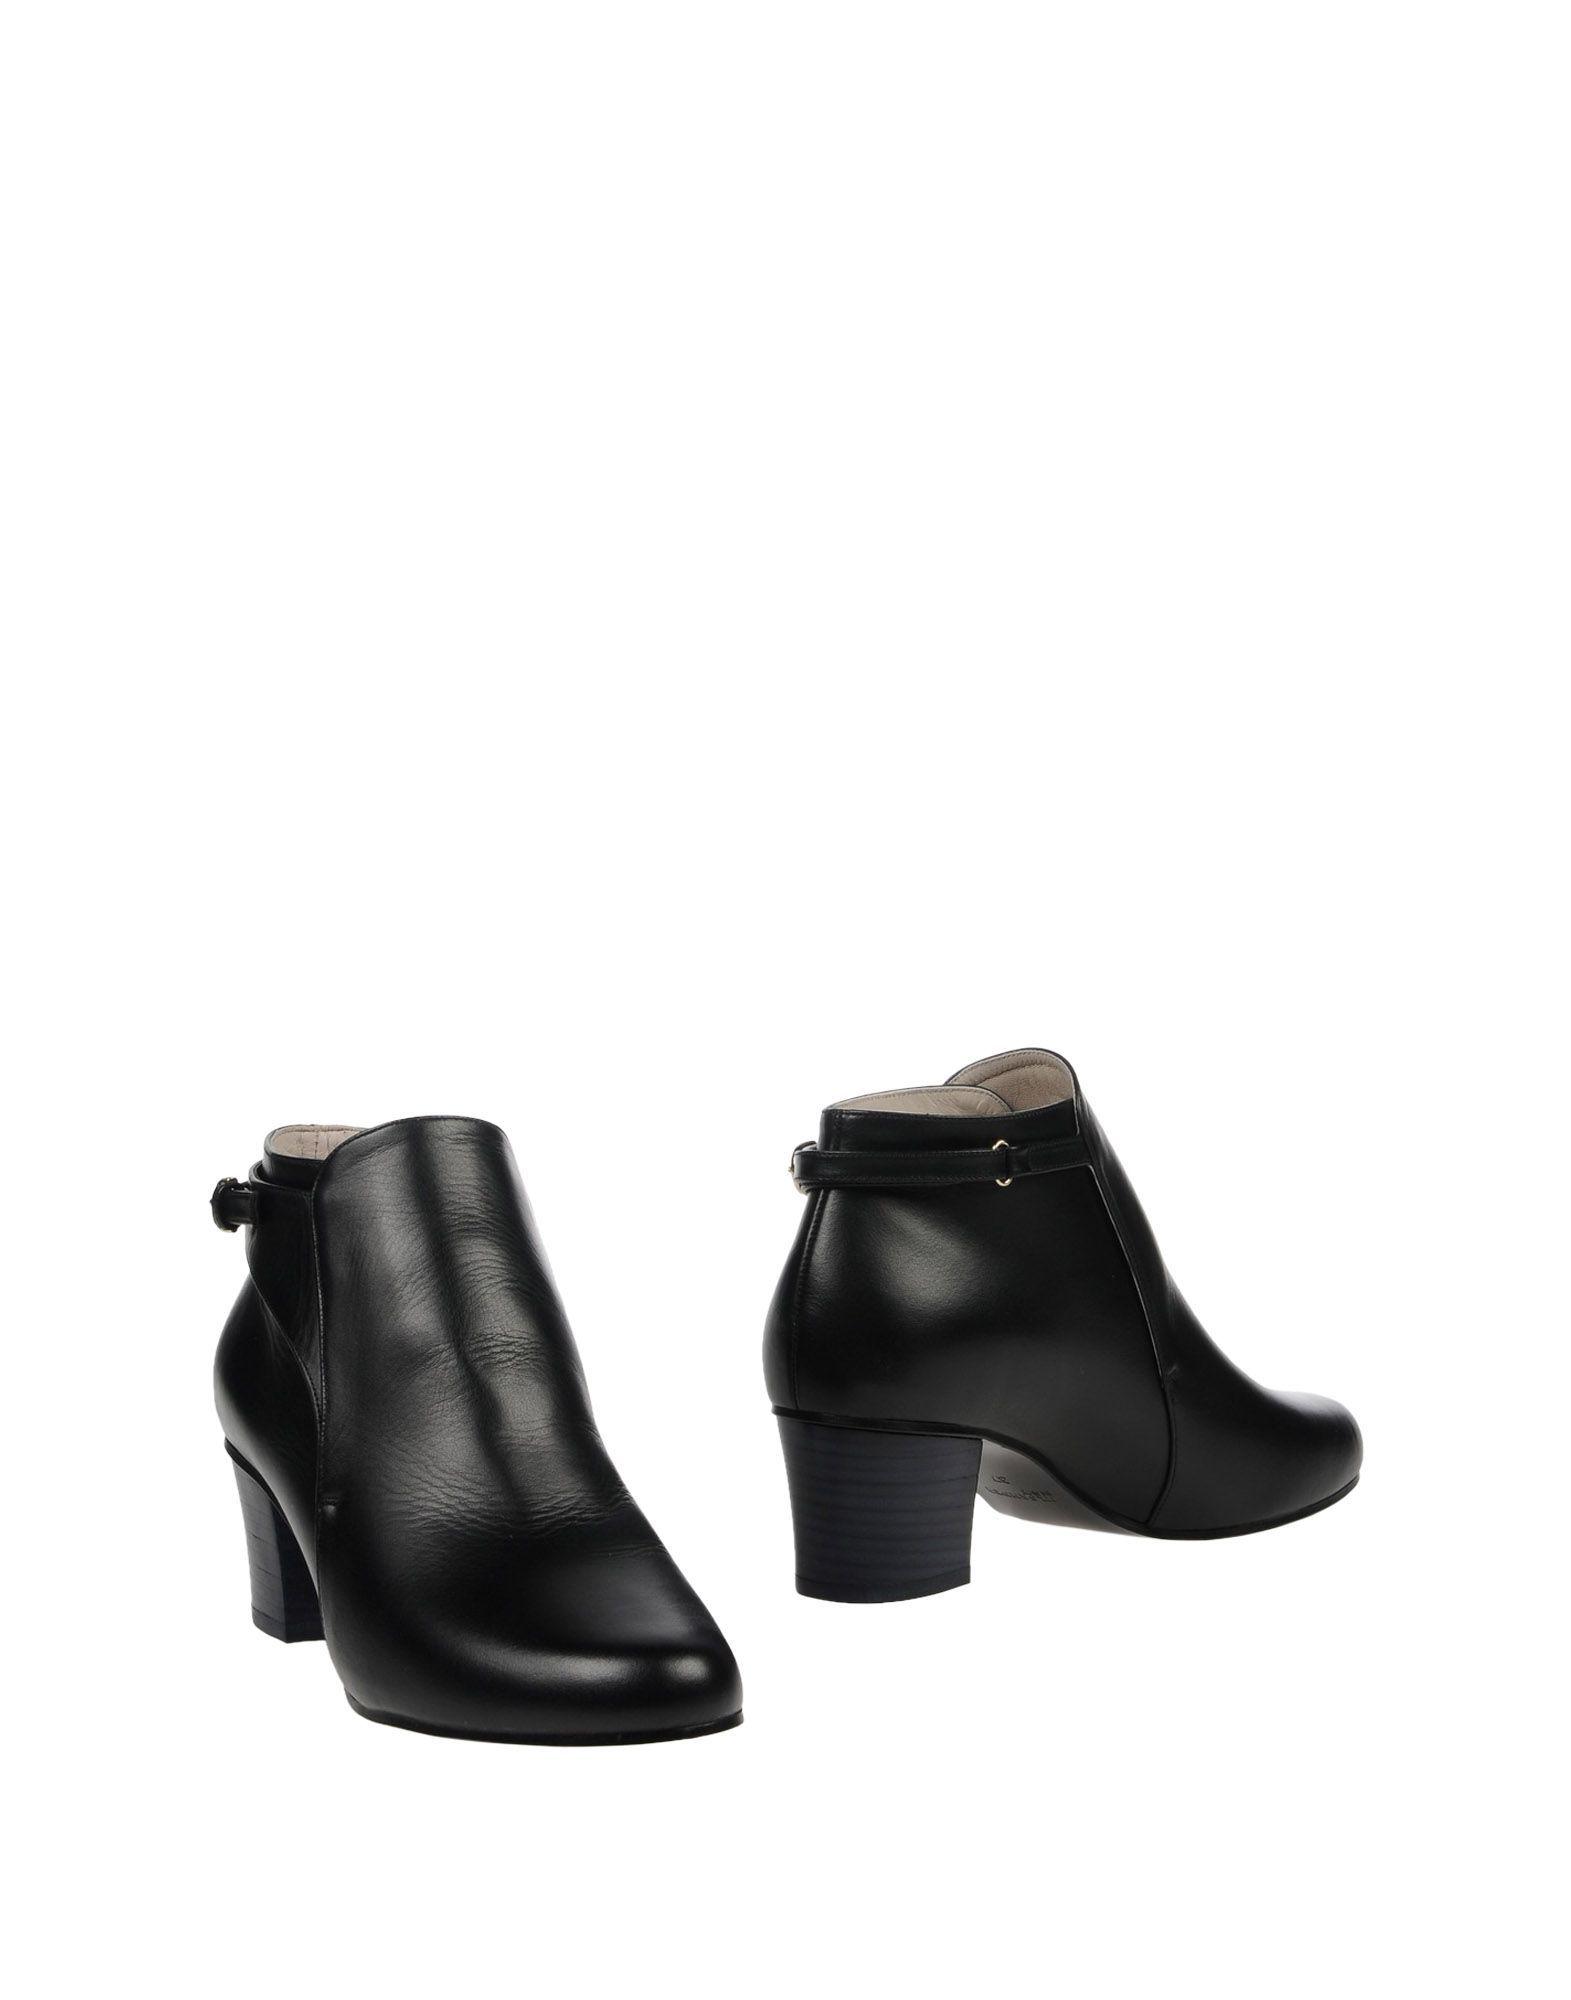 Jil Sander Navy Black Calf Leather Ankle Boots